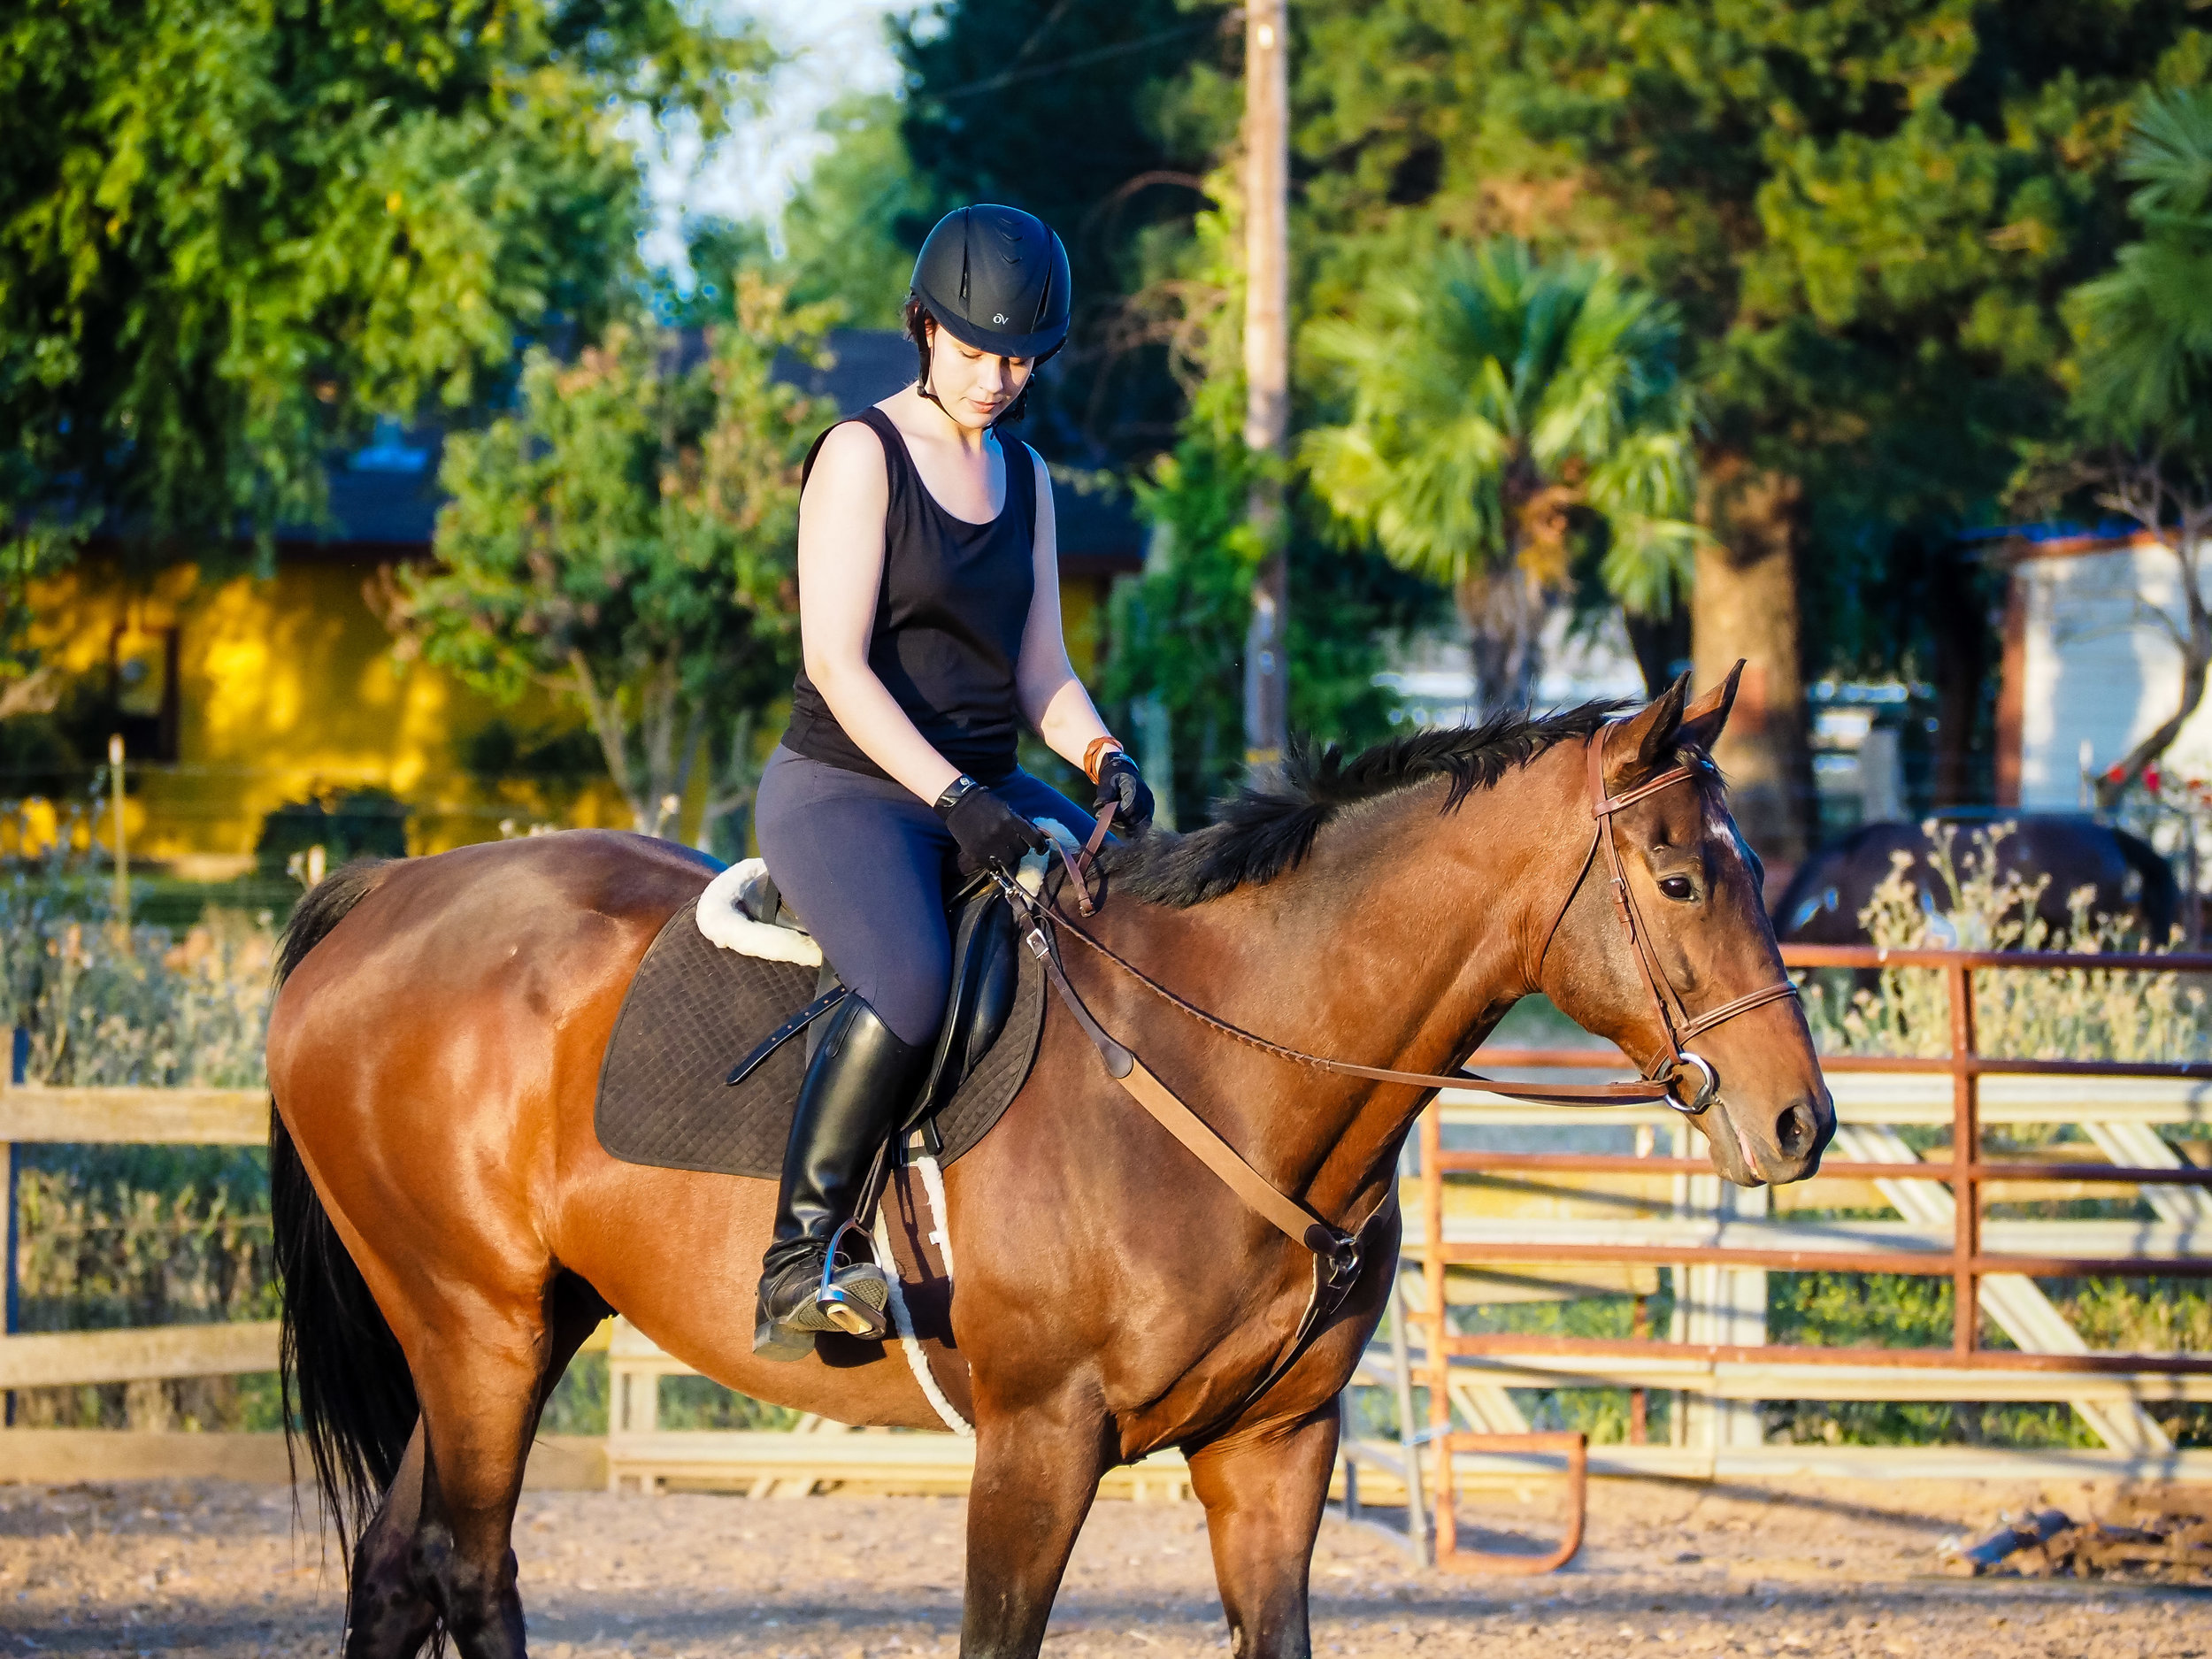 mikey-ottb-back-to-riding-2.jpg